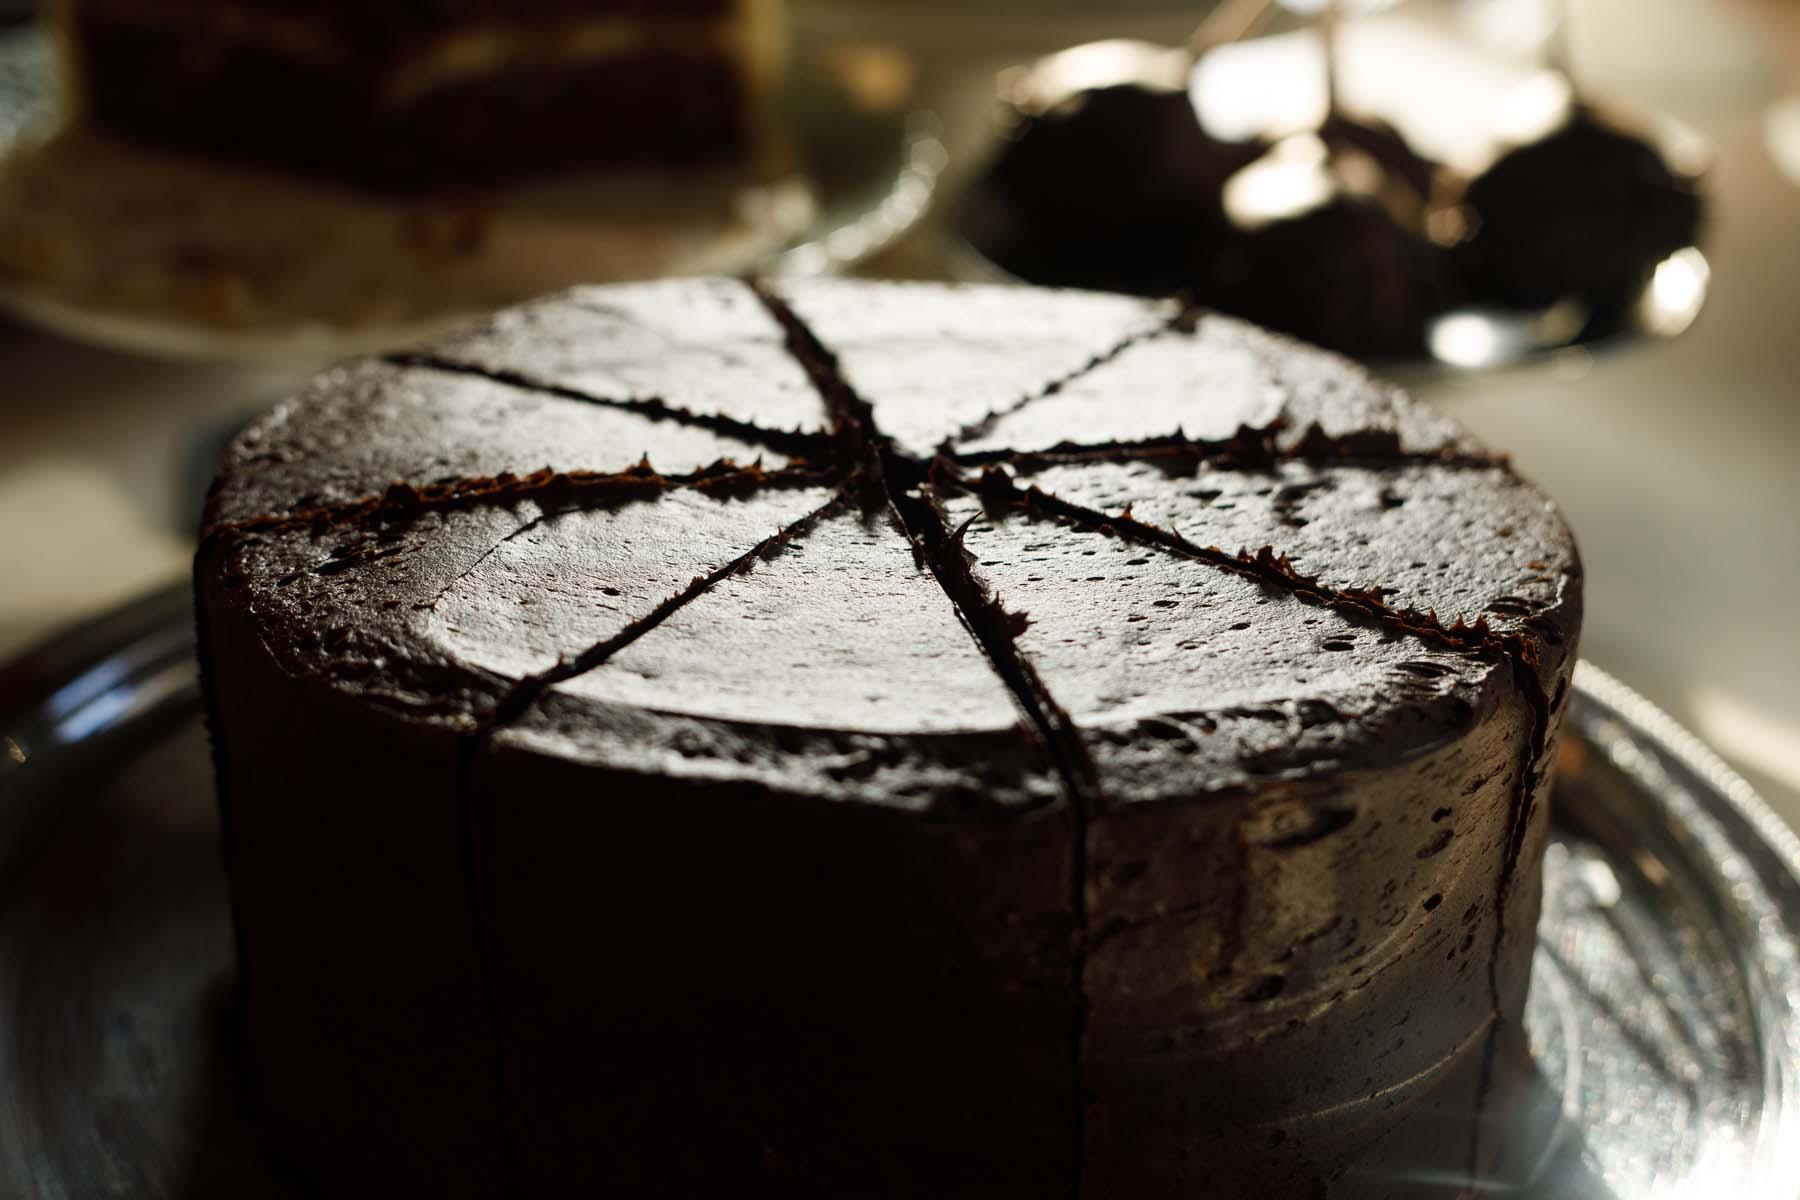 Best desserts in Wichita - Whole Chocolate Cake